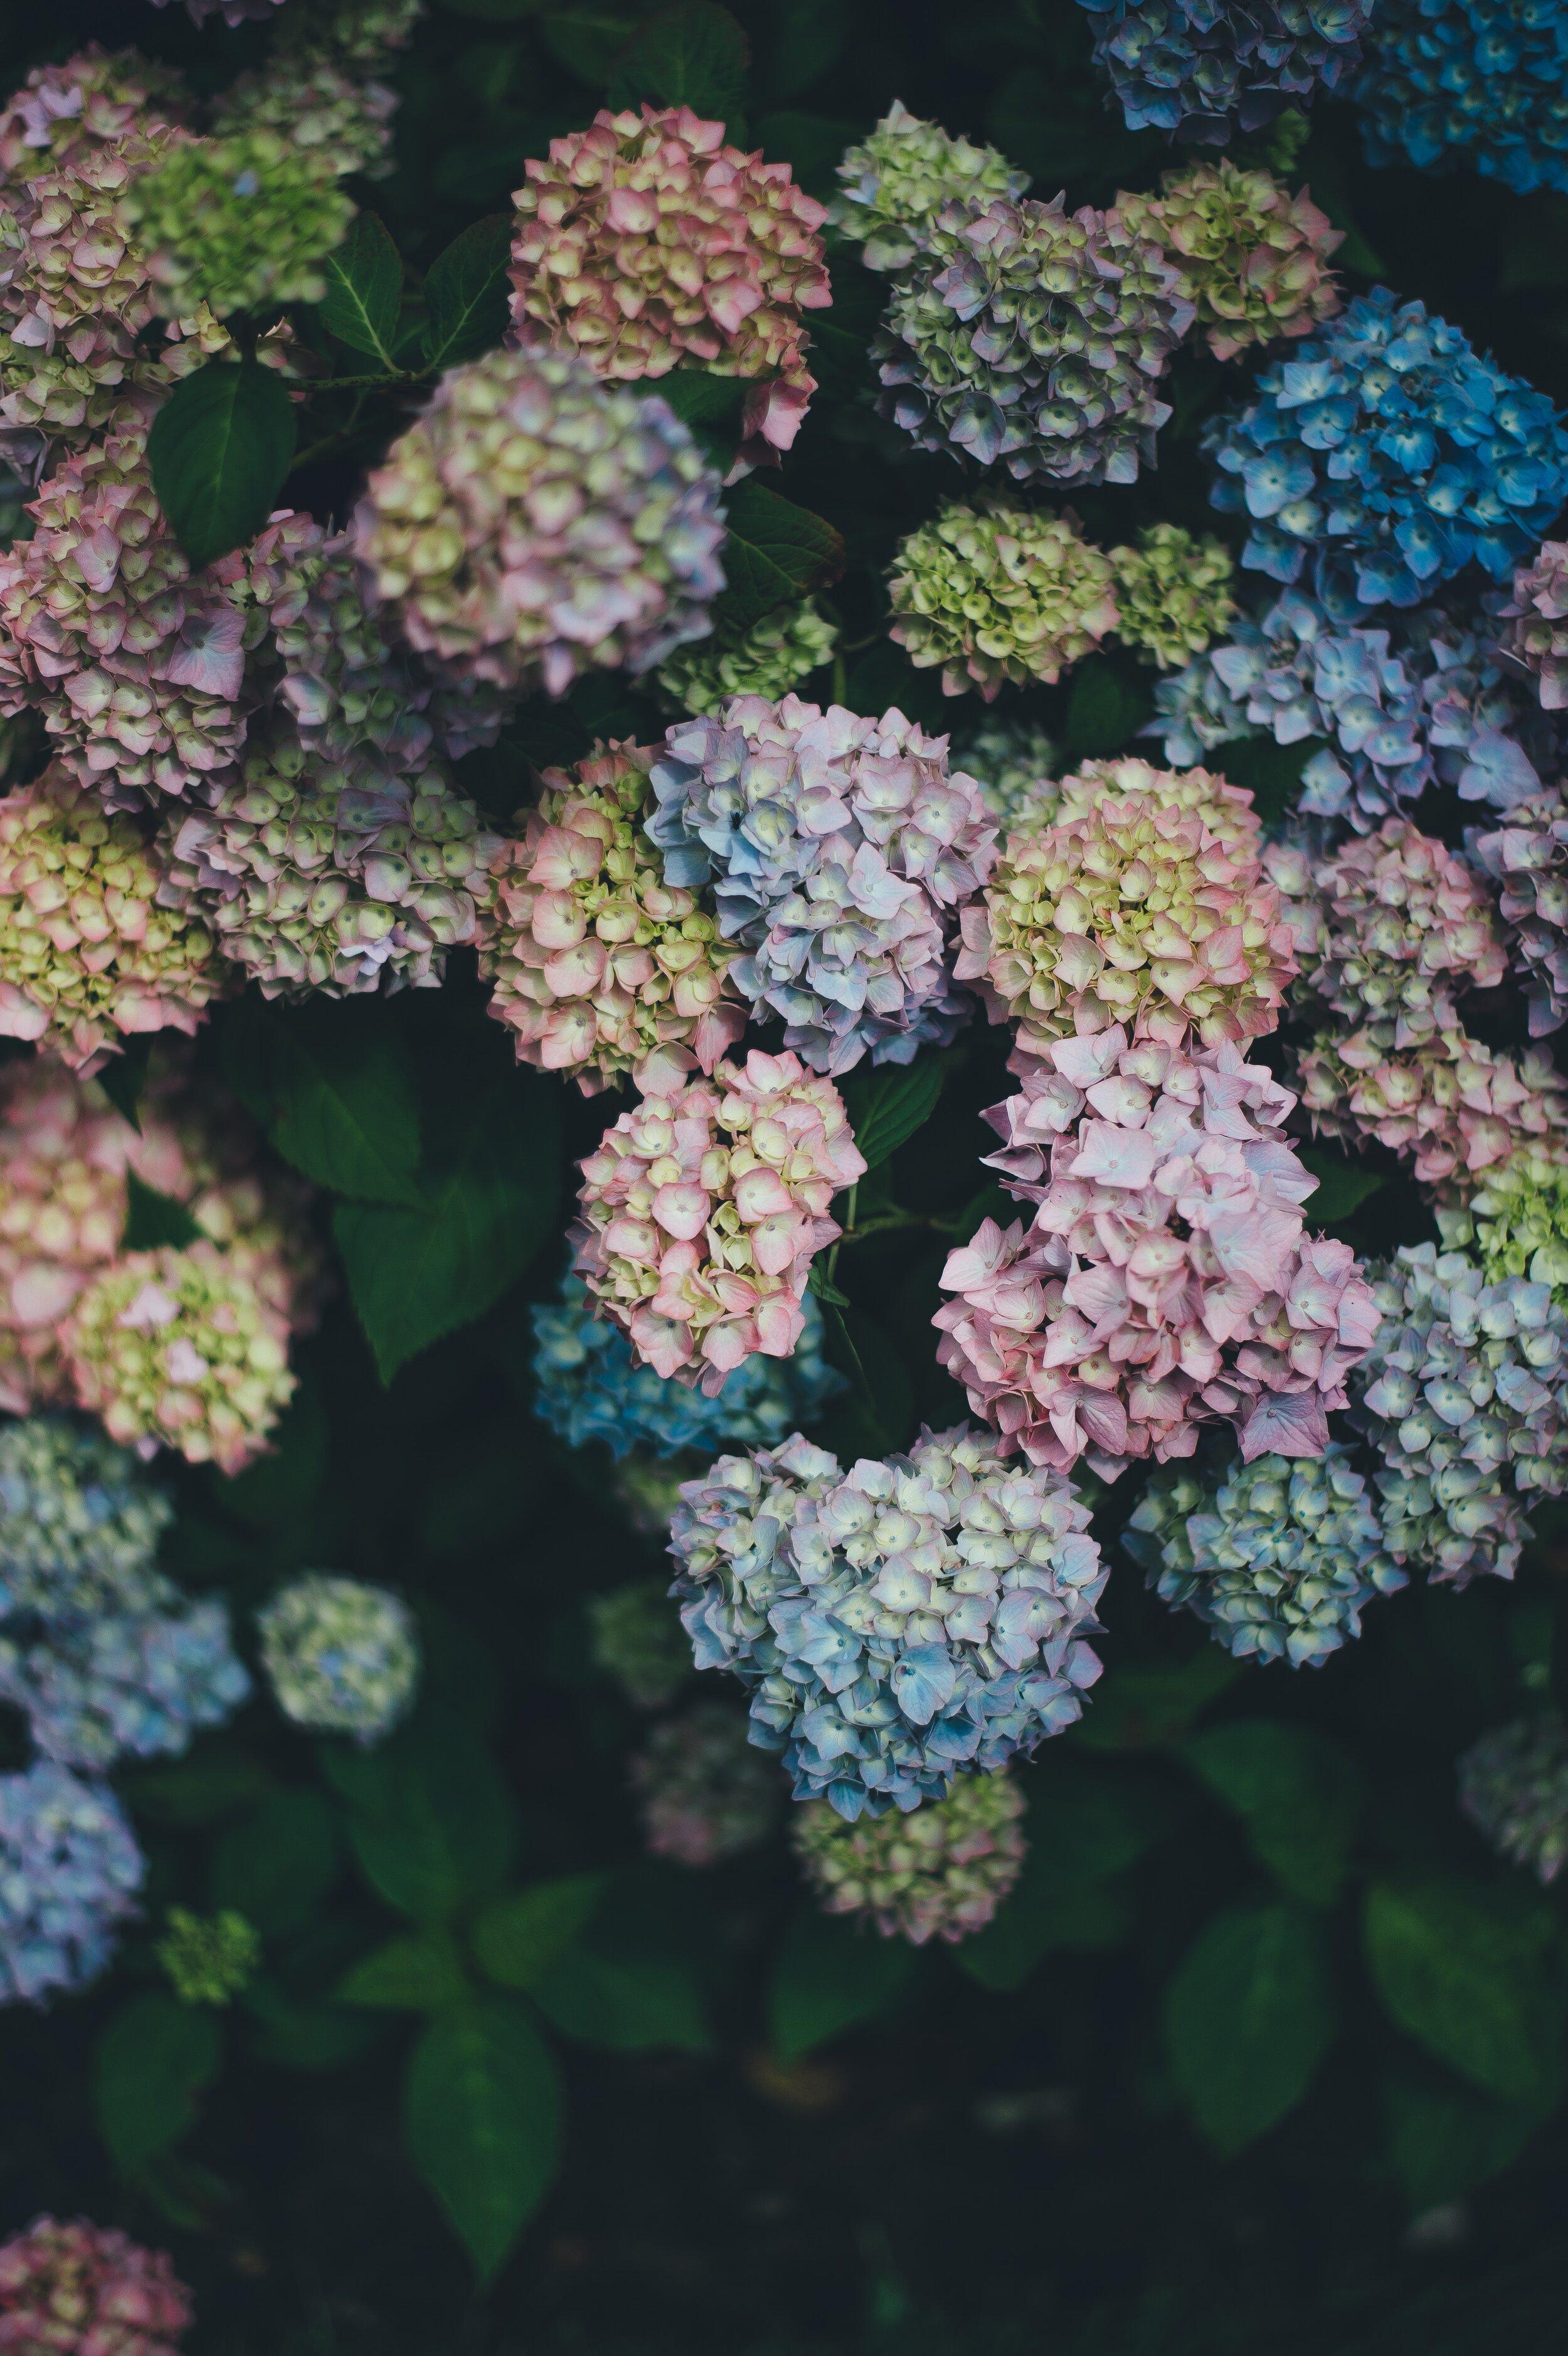 pastel blues, pinks, greens, dark greys